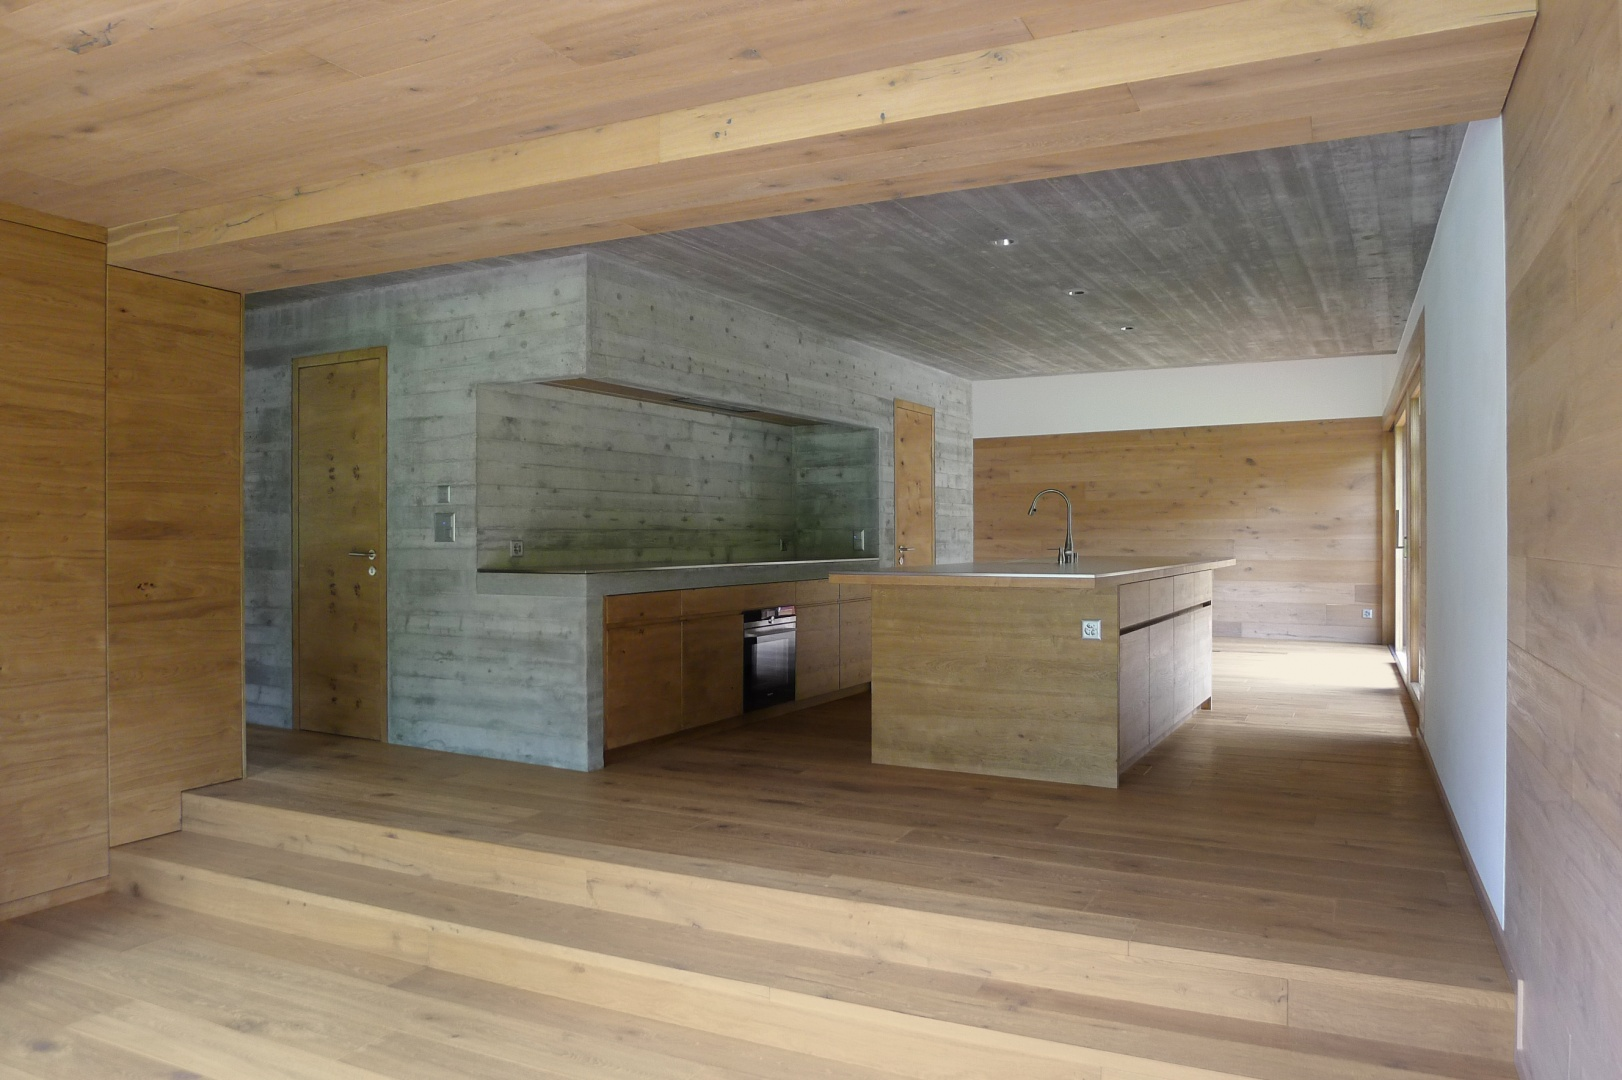 transformation et agrandissement d 39 une grange documentation suisse du batiment. Black Bedroom Furniture Sets. Home Design Ideas